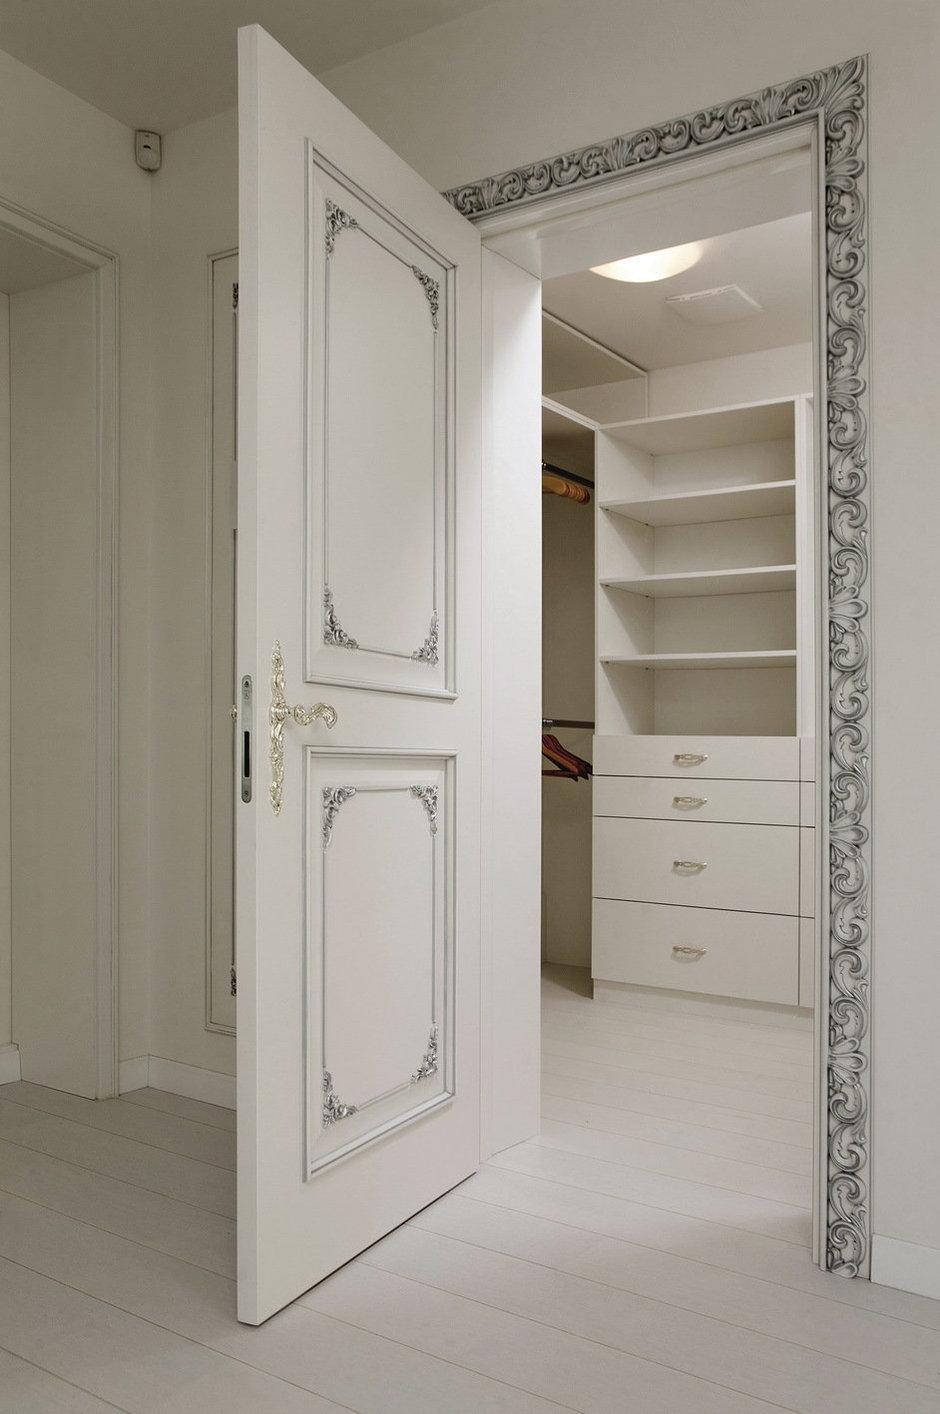 Фотография: Прихожая в стиле Классический, Квартира, Дома и квартиры – фото на InMyRoom.ru